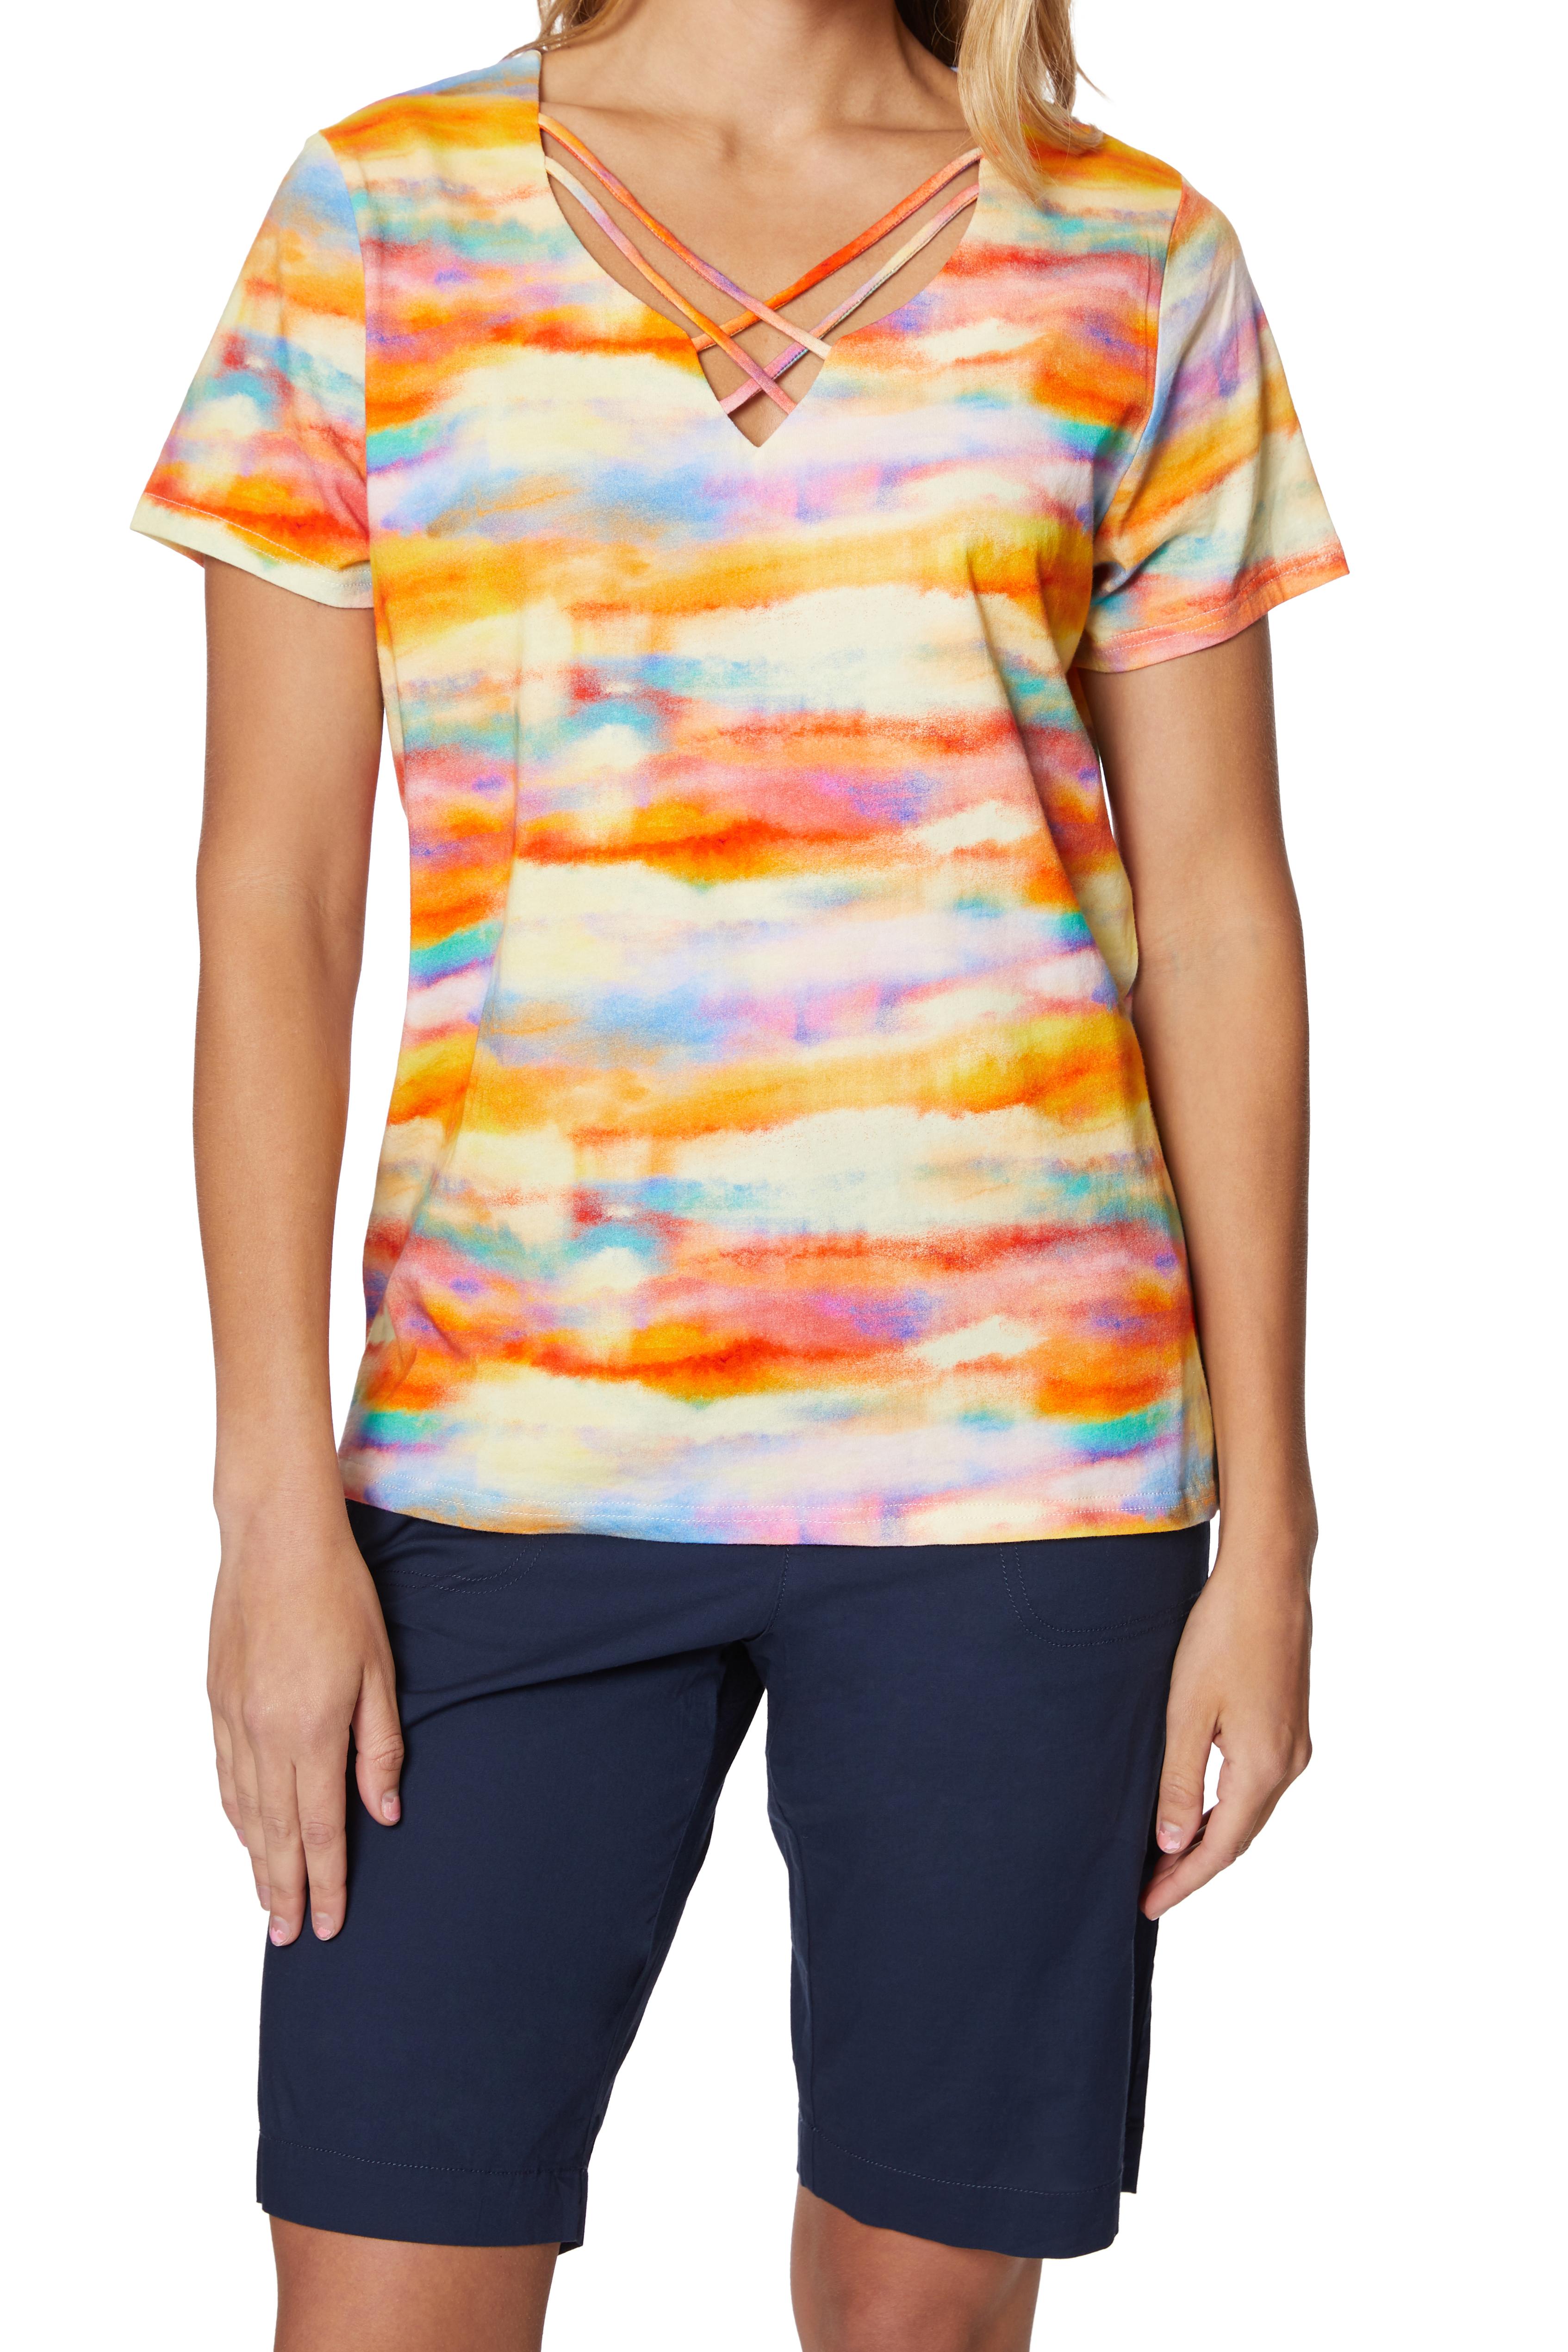 Caribbean Joe® Criss Cross Knit Top -Saffron - Front